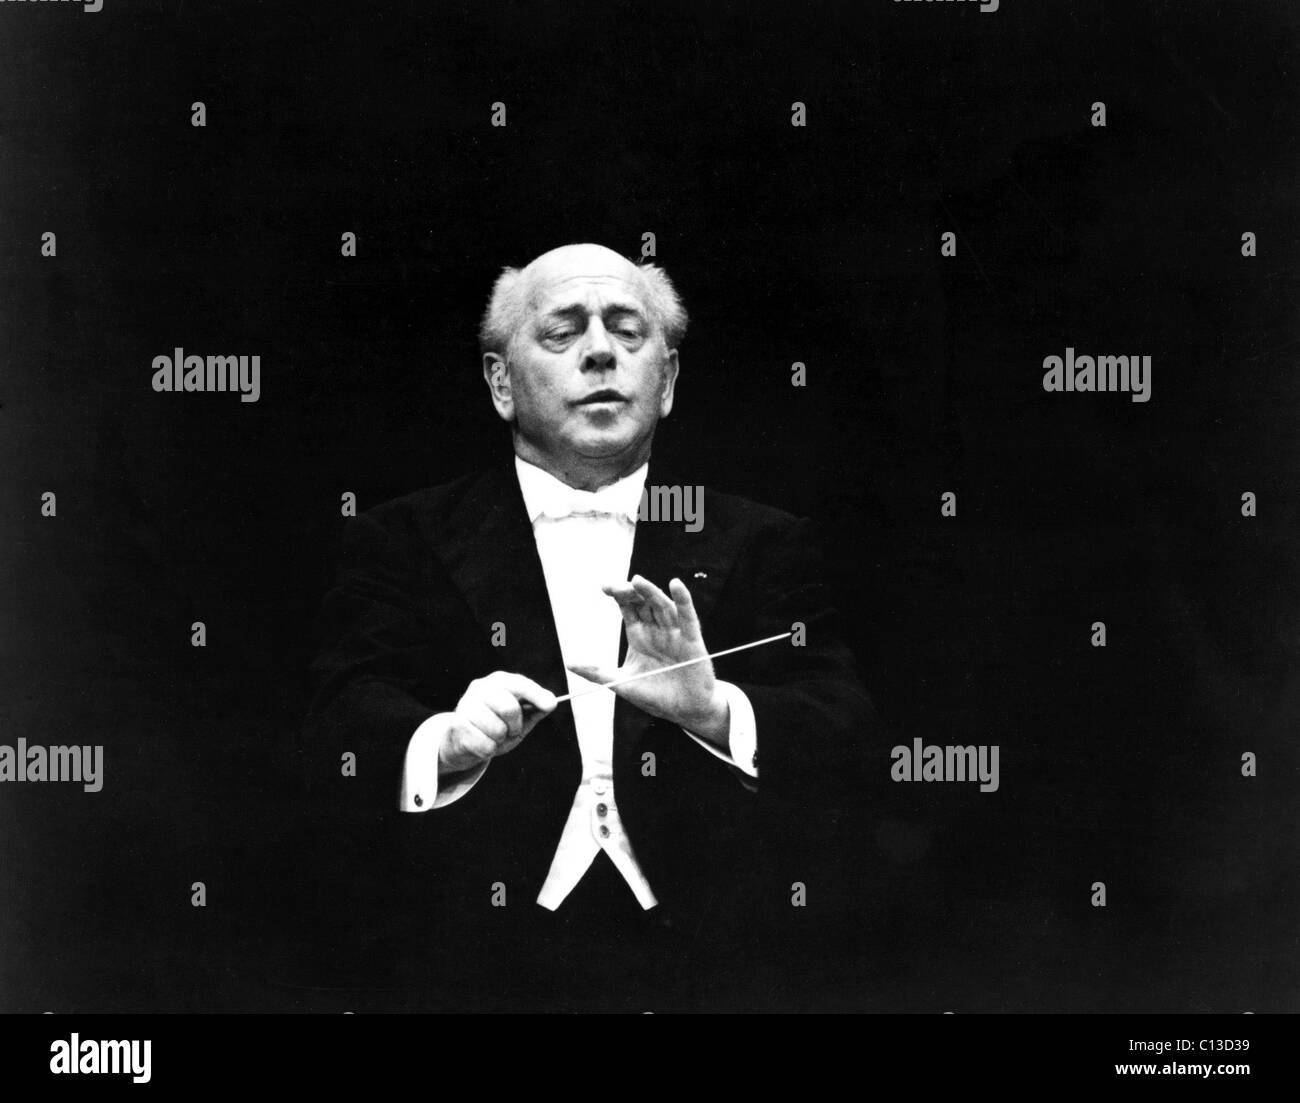 Eugene Ormandy, ca. 1970s - Stock Image